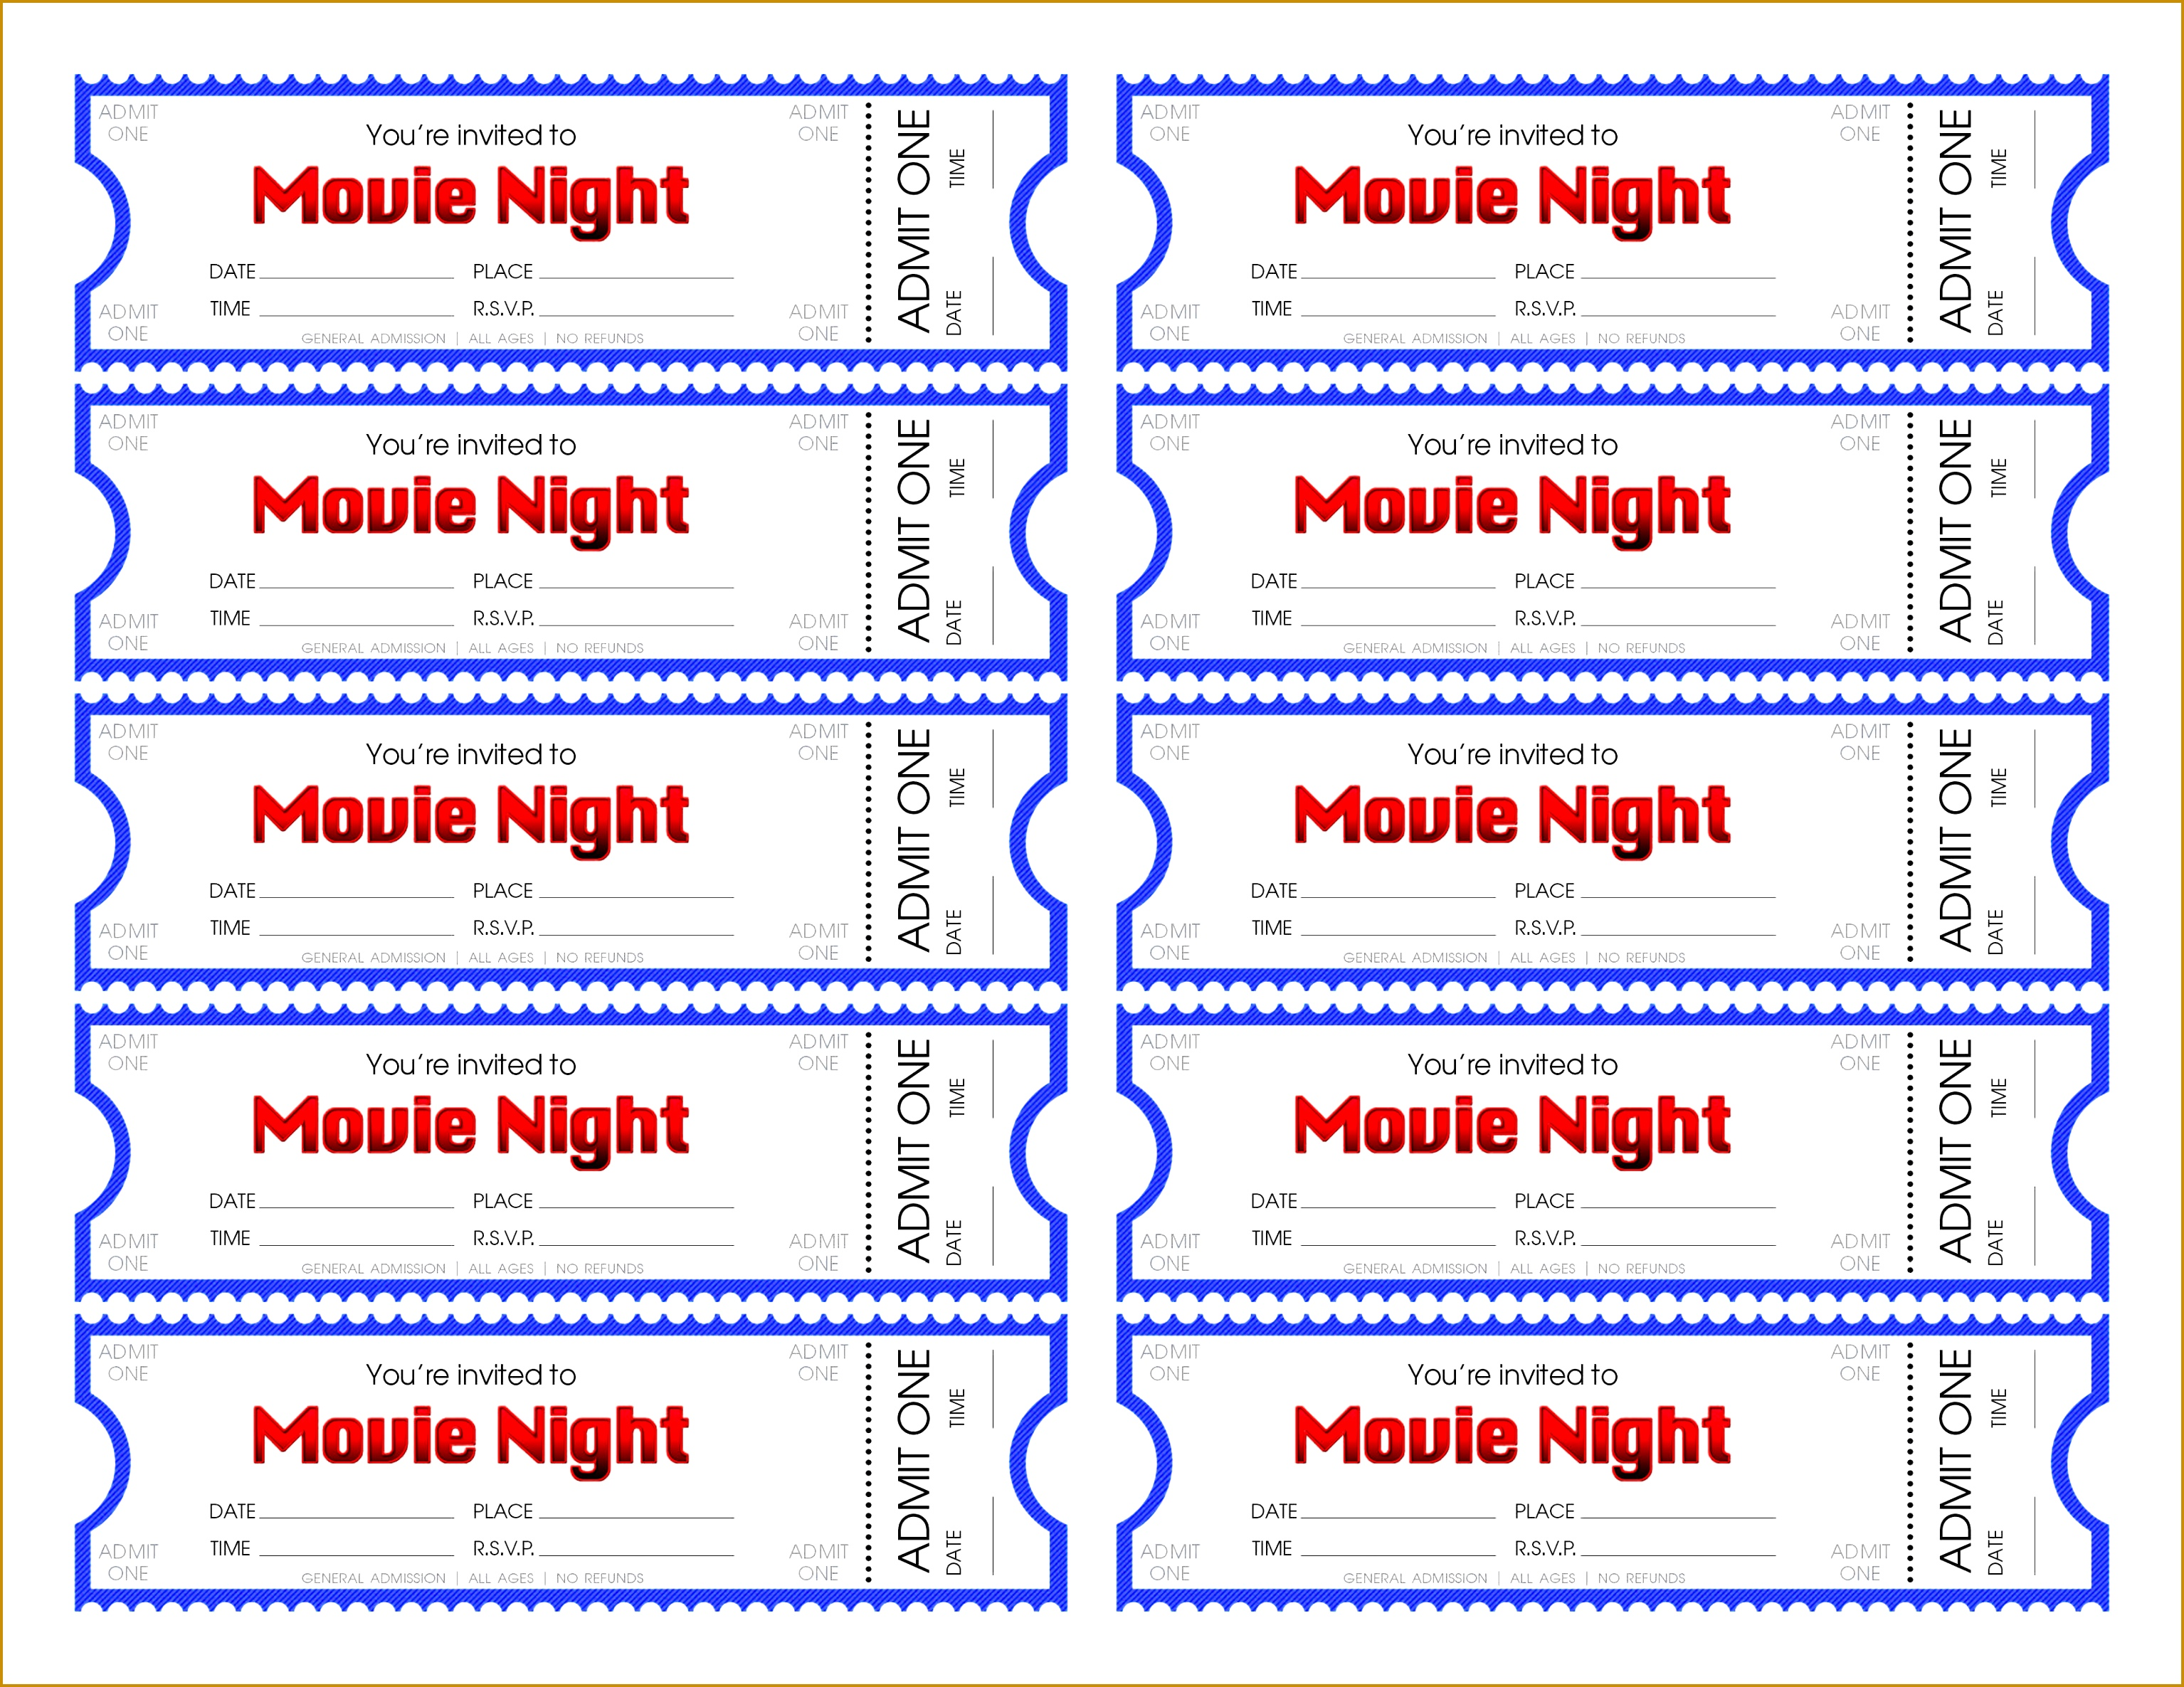 stunning movie ticket generator make your own night tickets 30692371